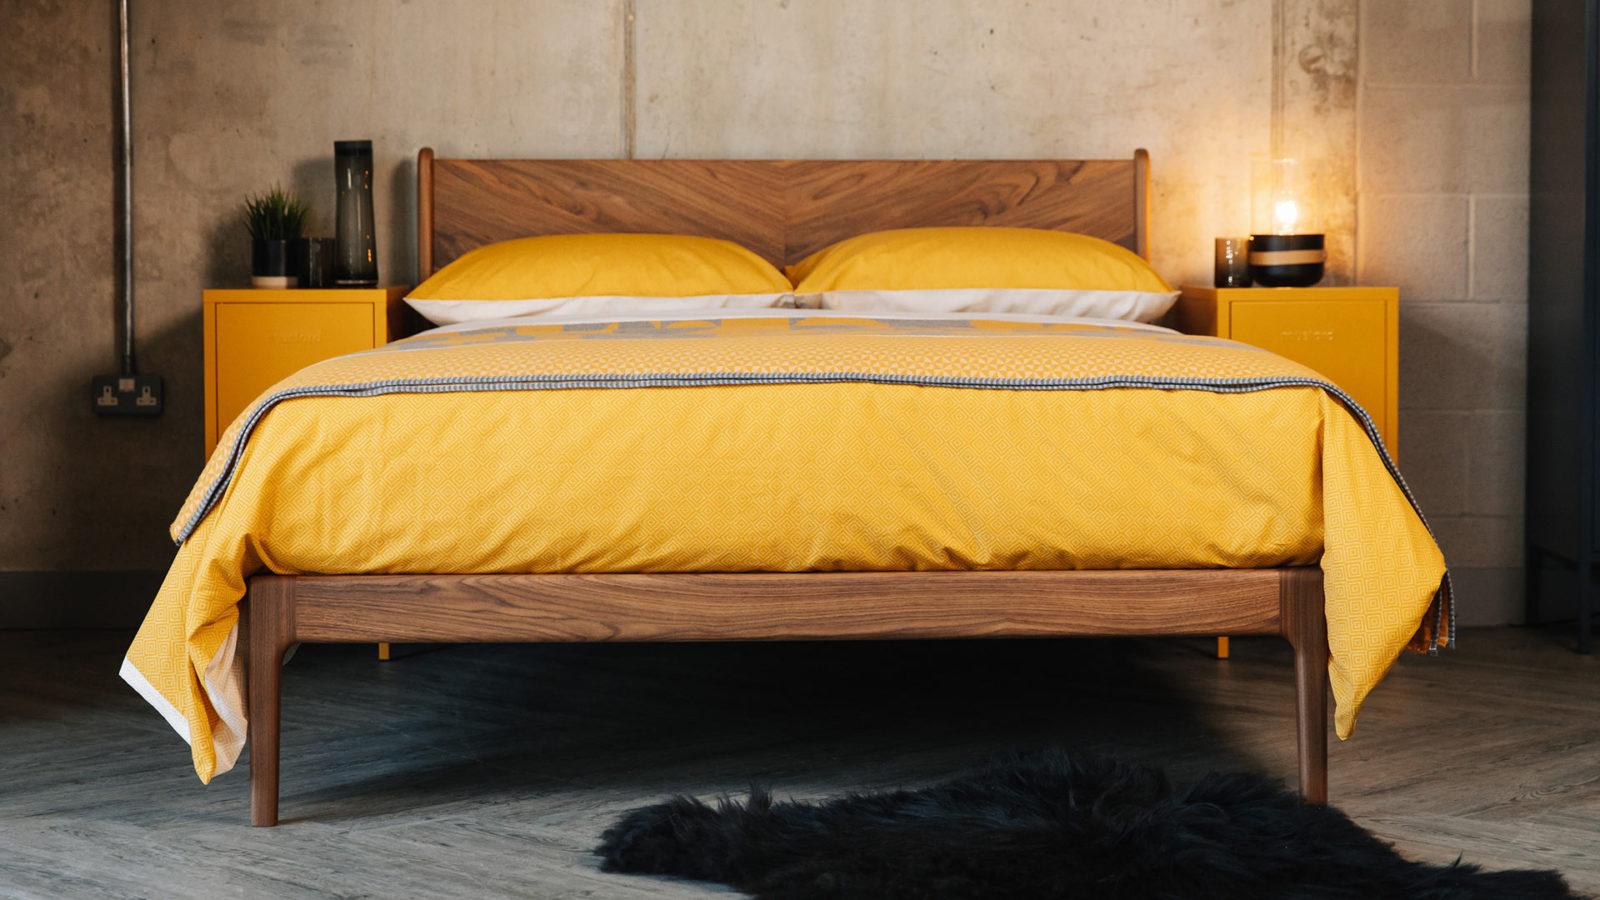 mid century style Hoxton bed in Walnut wood